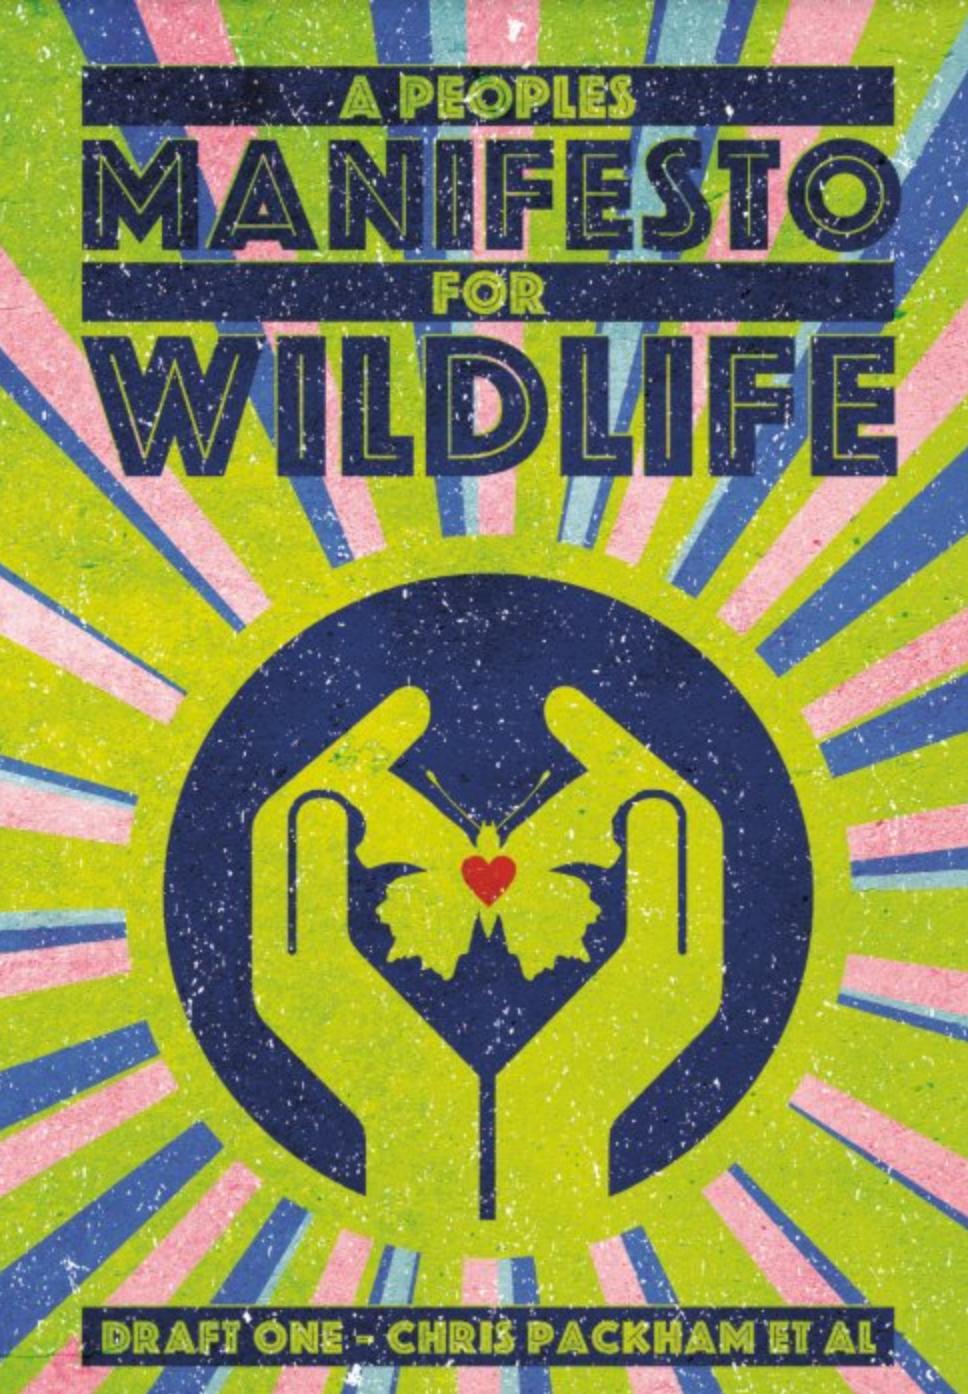 Chris Packham Manifesto for Wildlife